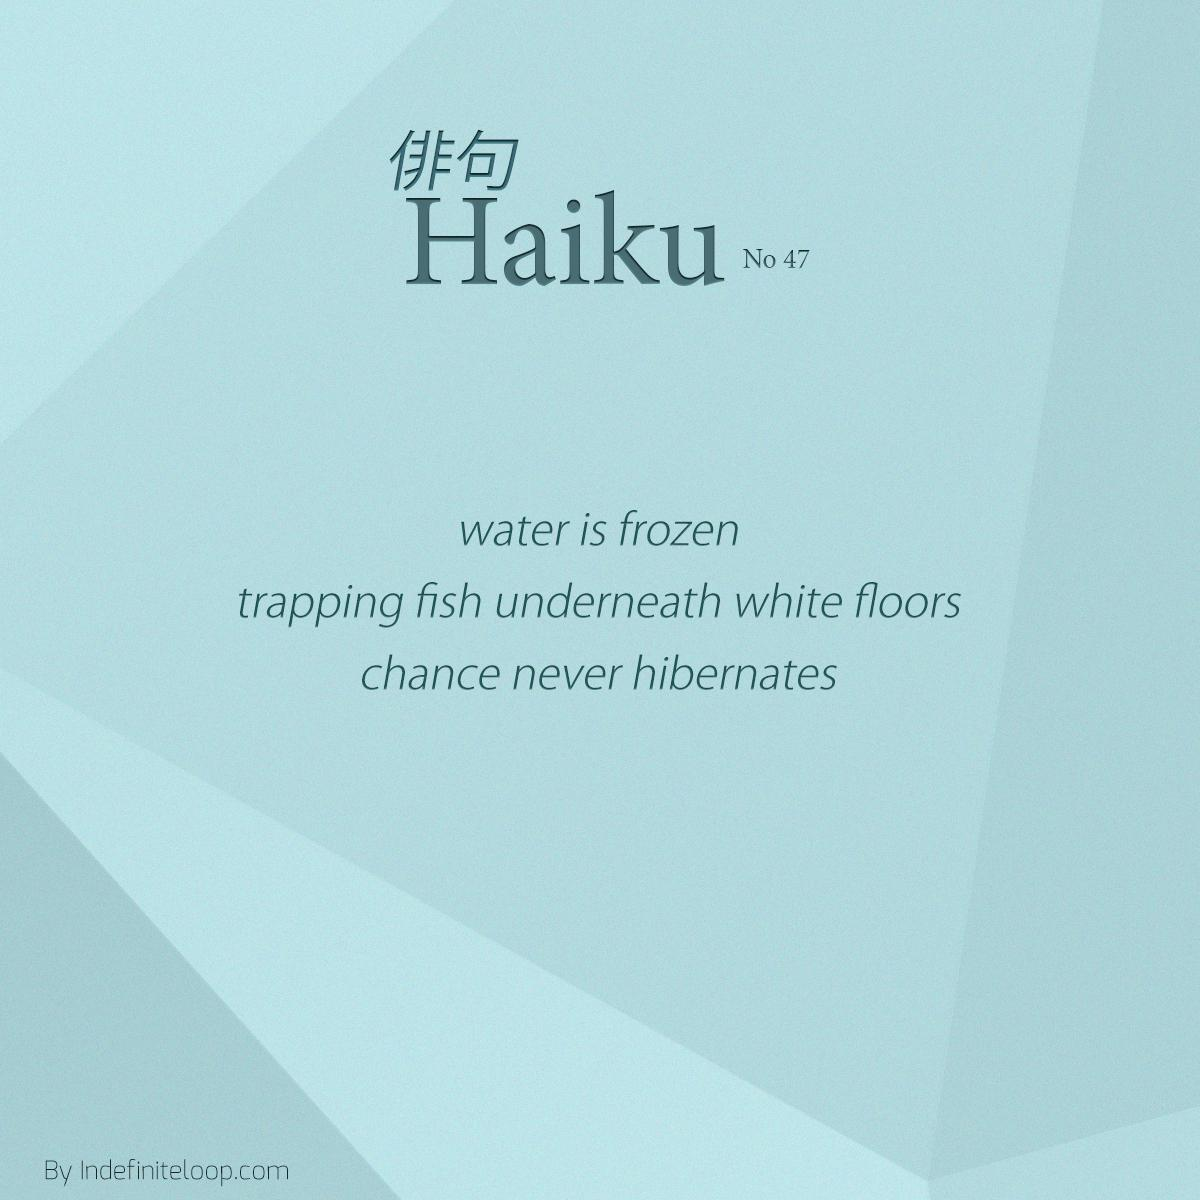 indefiniteloop.com -Haiku No. 47 - No Hibernation.